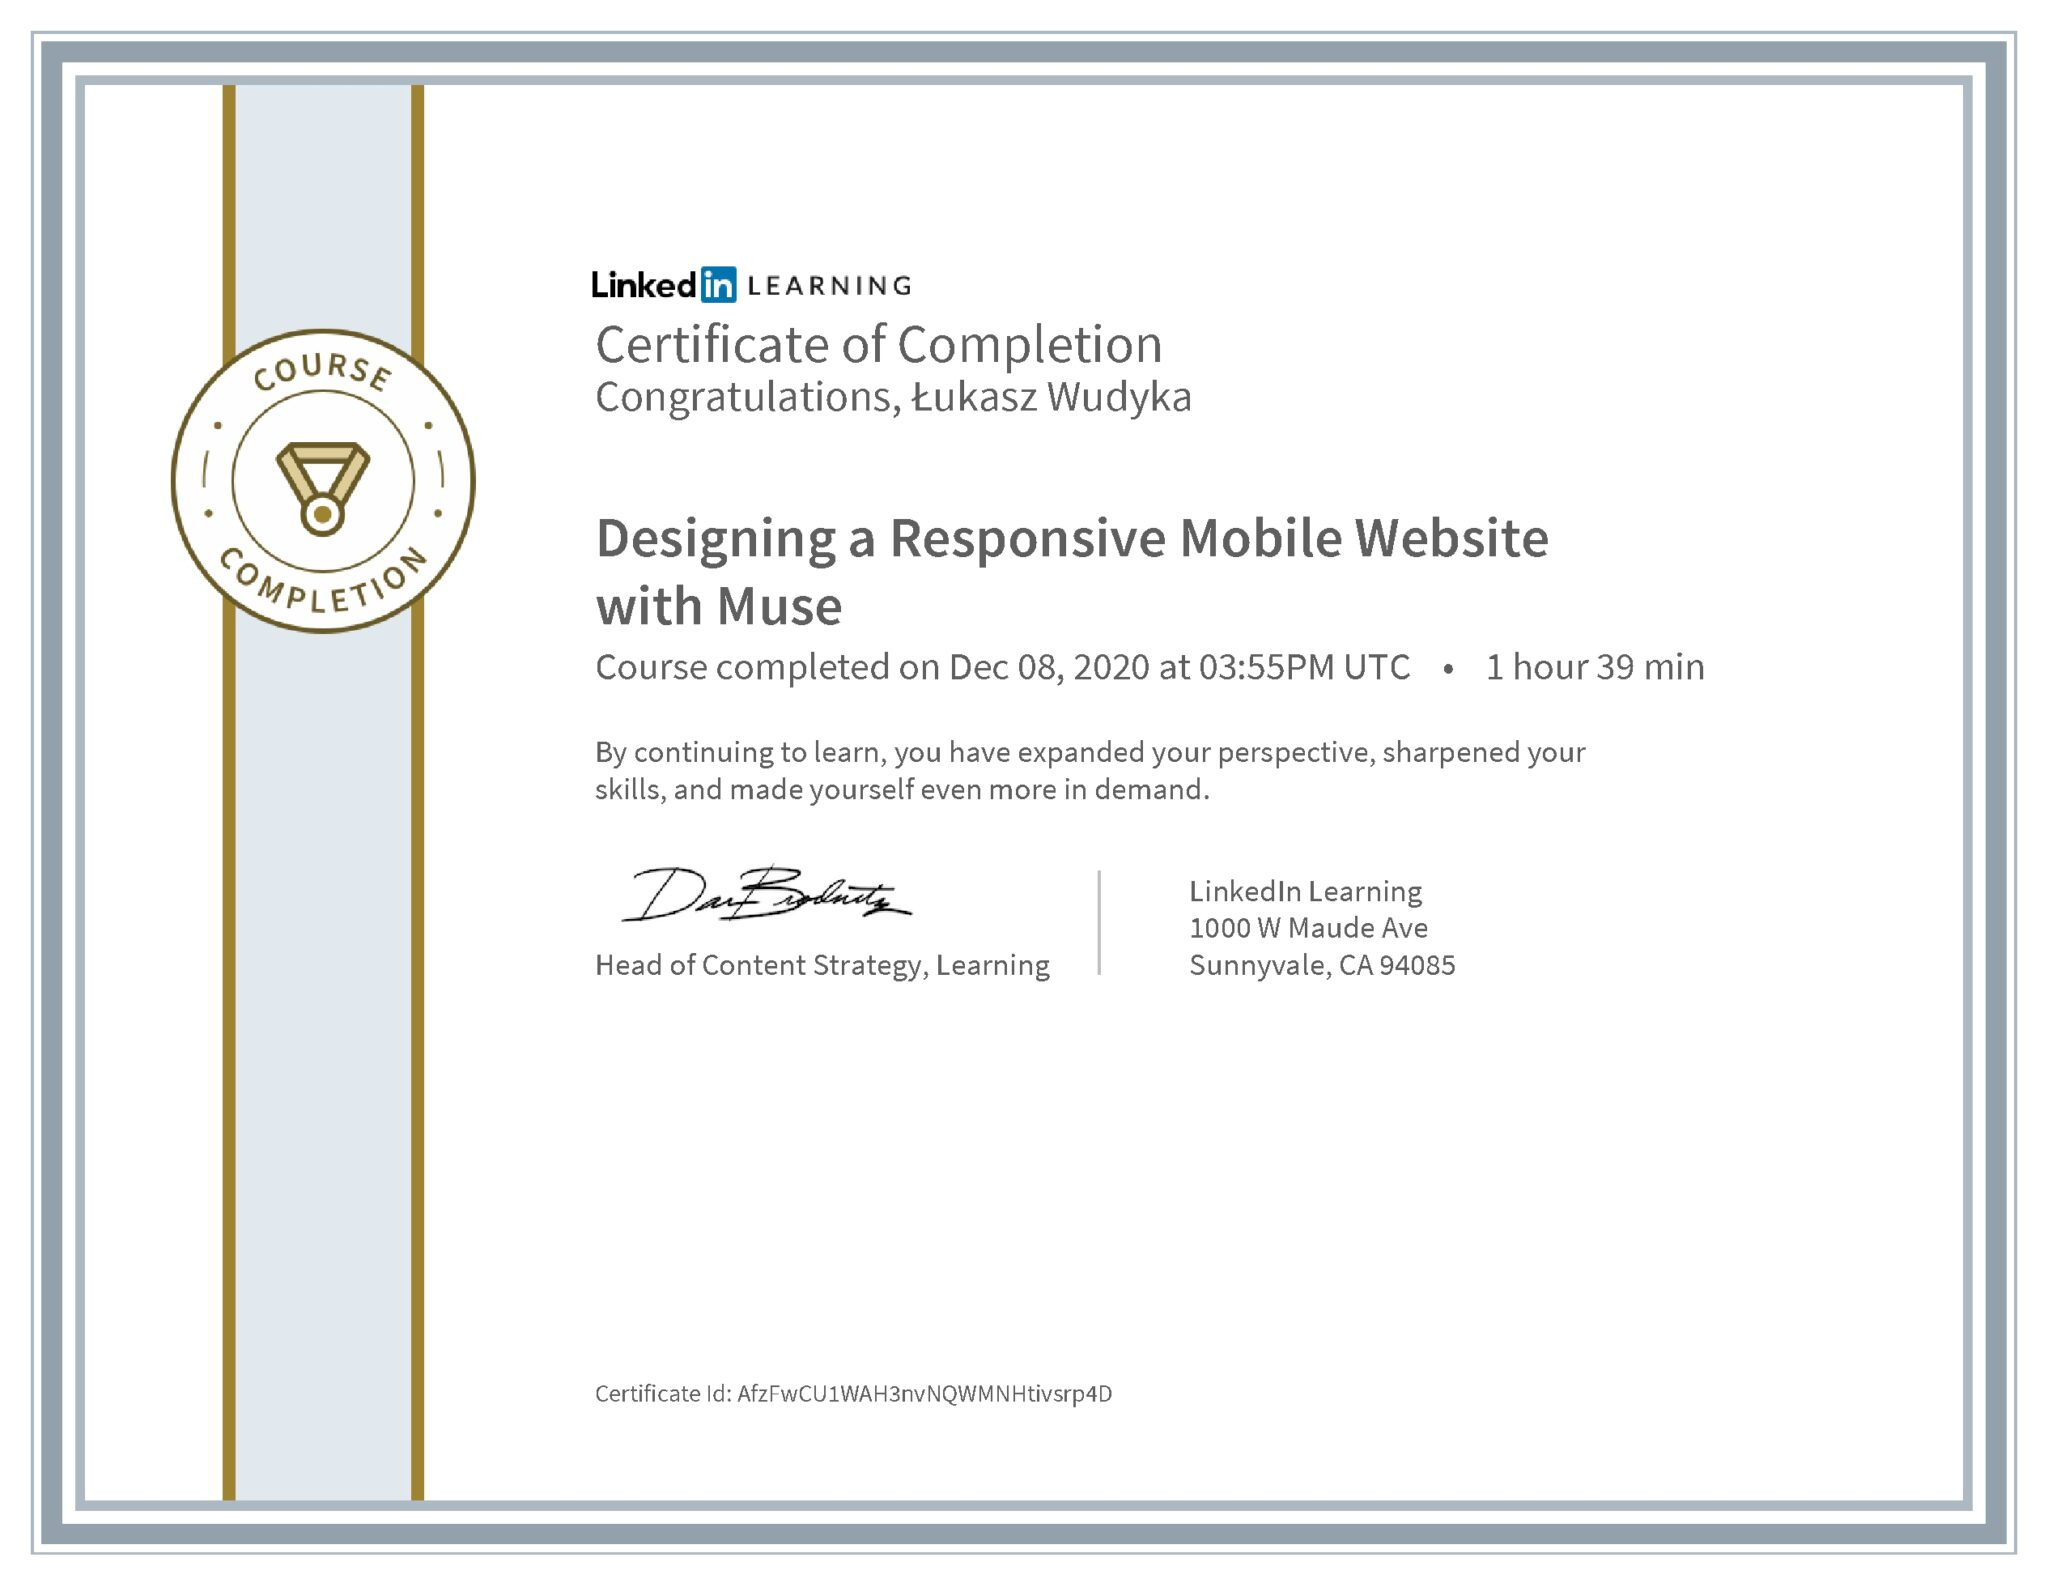 Łukasz Wudyka certyfikat LinkedIn Designing a Responsive Mobile Website with Muse